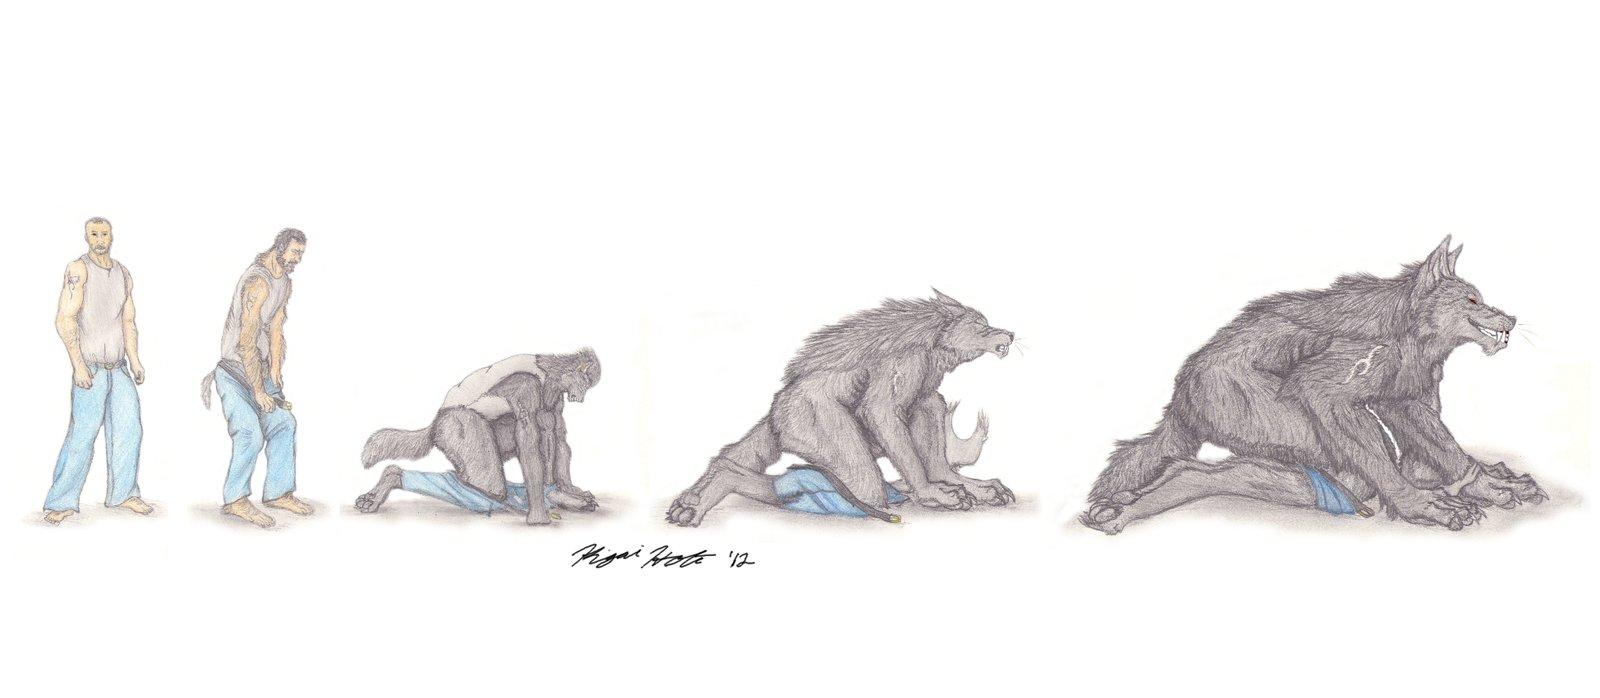 Drawn wolfman rage 24 Kigai Holt Wolf Sequence